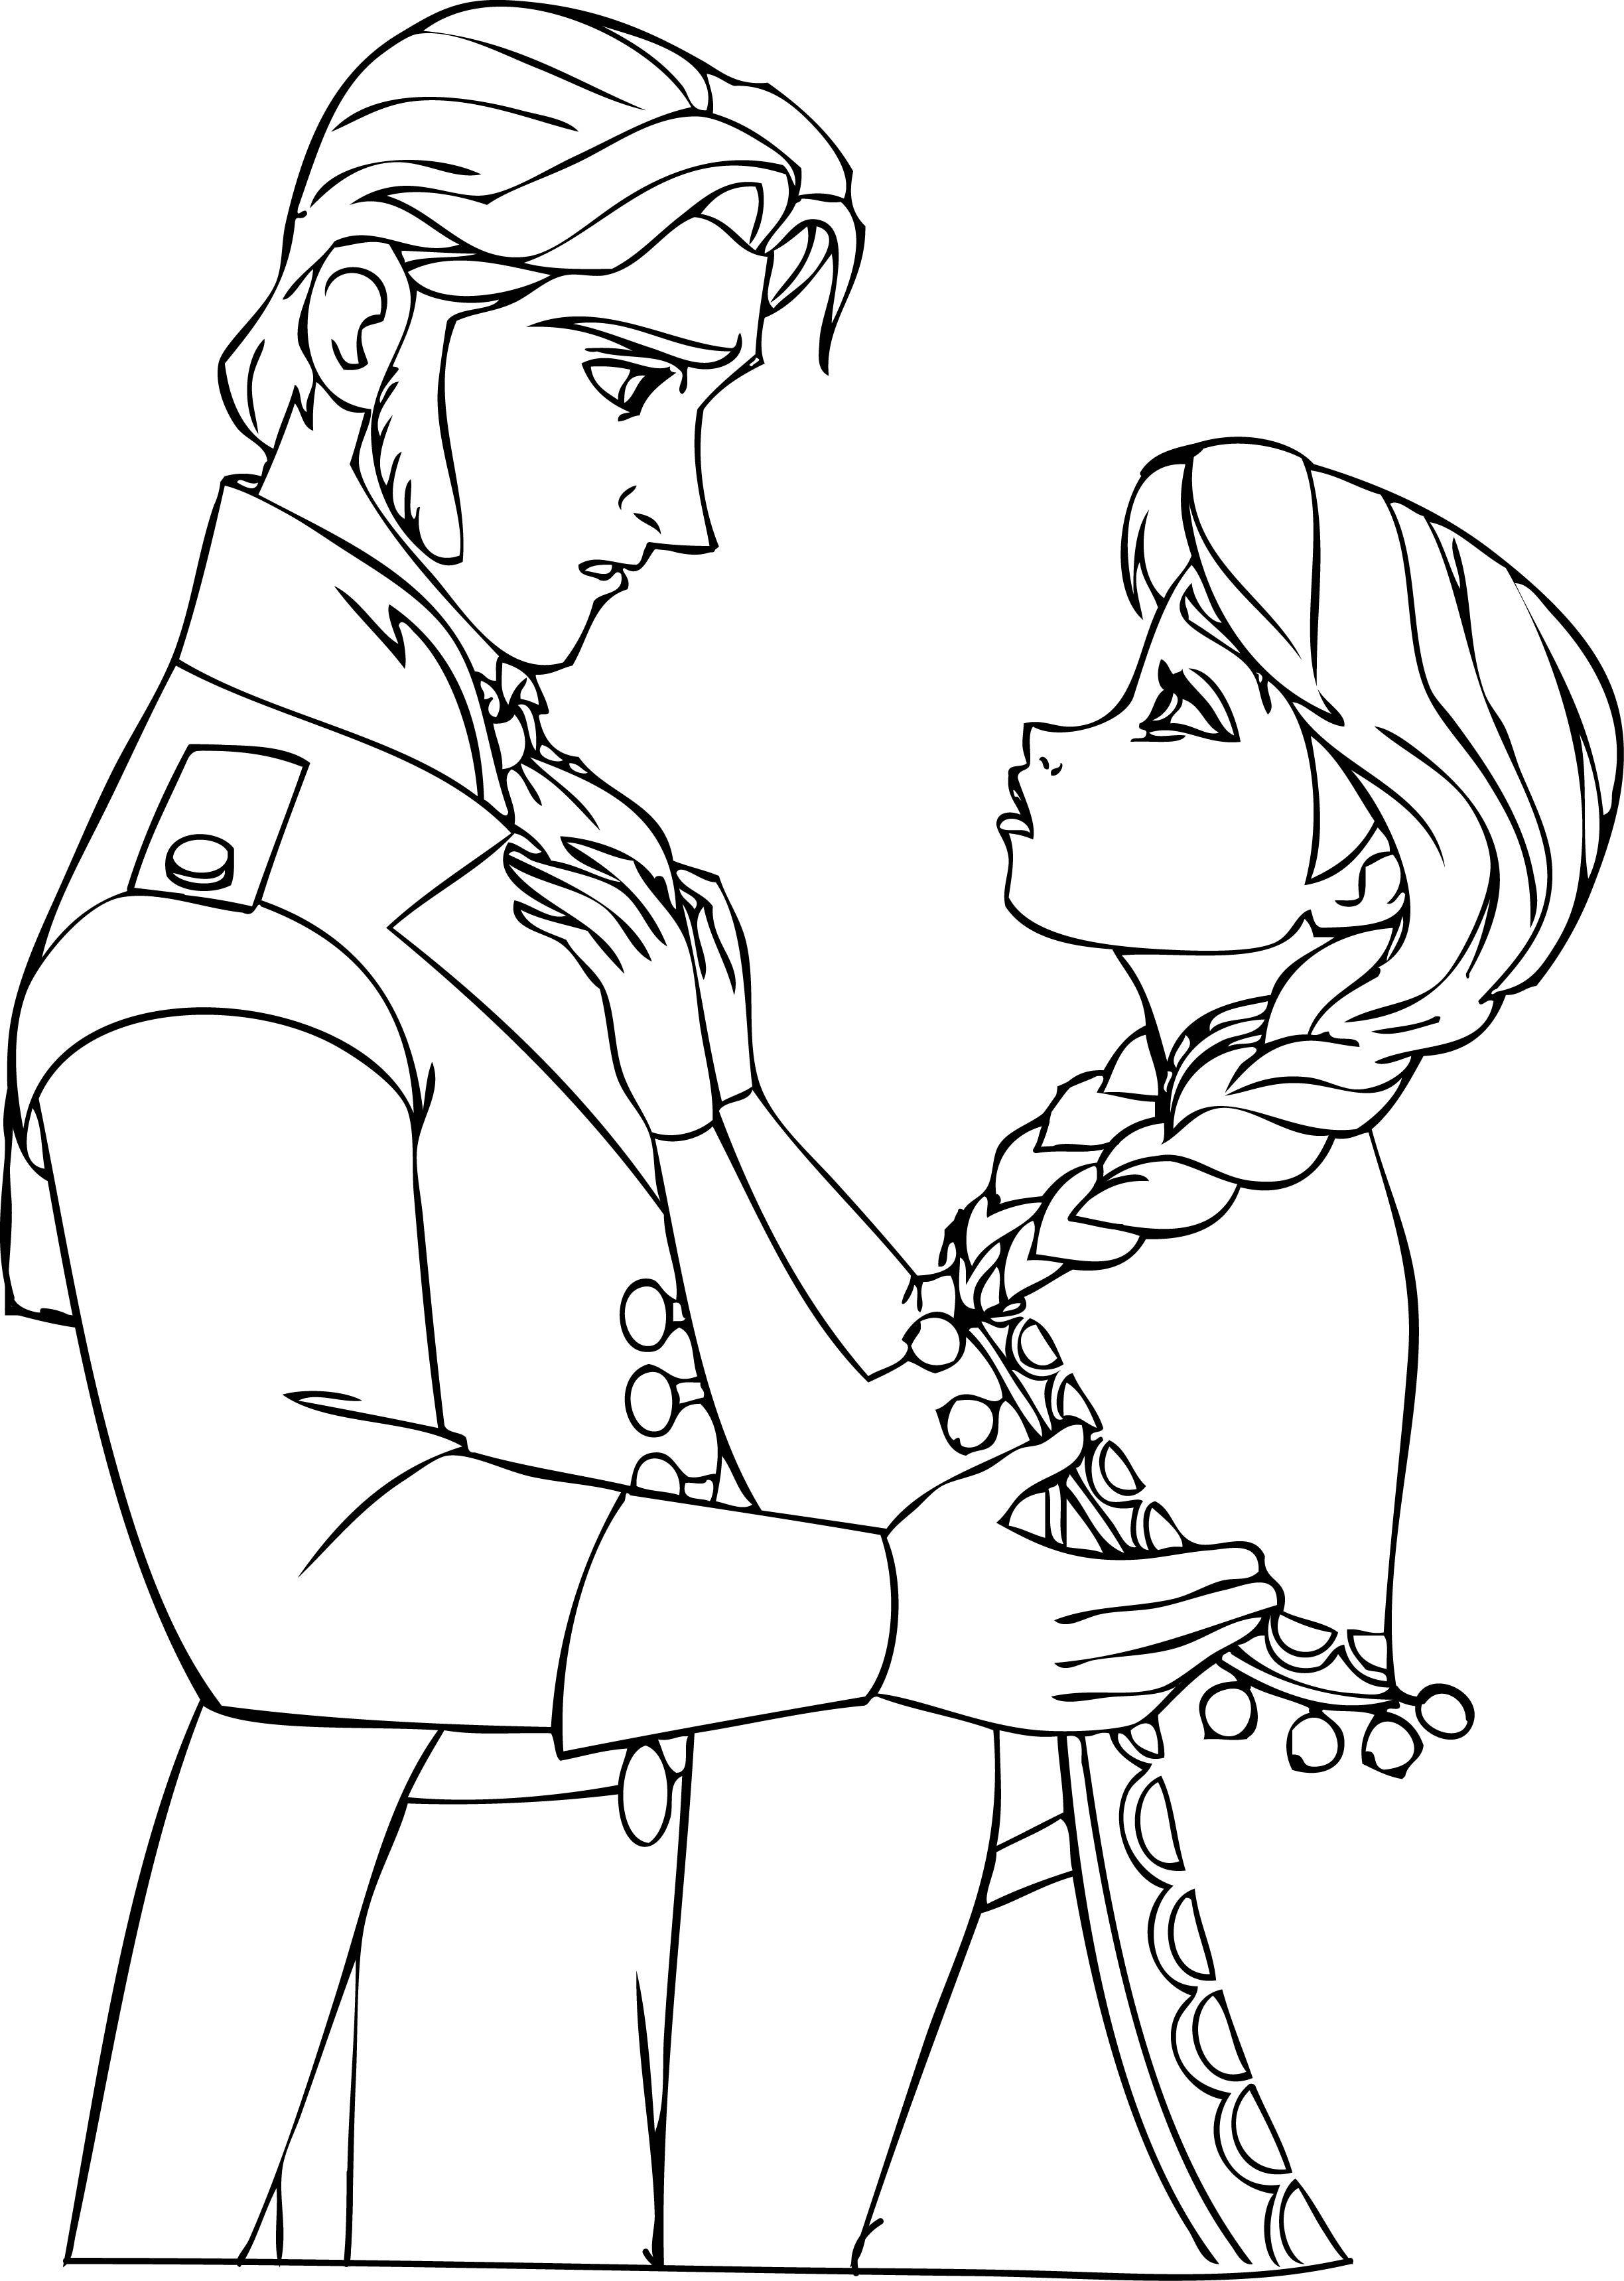 Anna Hans Frozen Coloring Sheet 01 Frozen Coloring Pages Frozen Coloring Coloring Pages